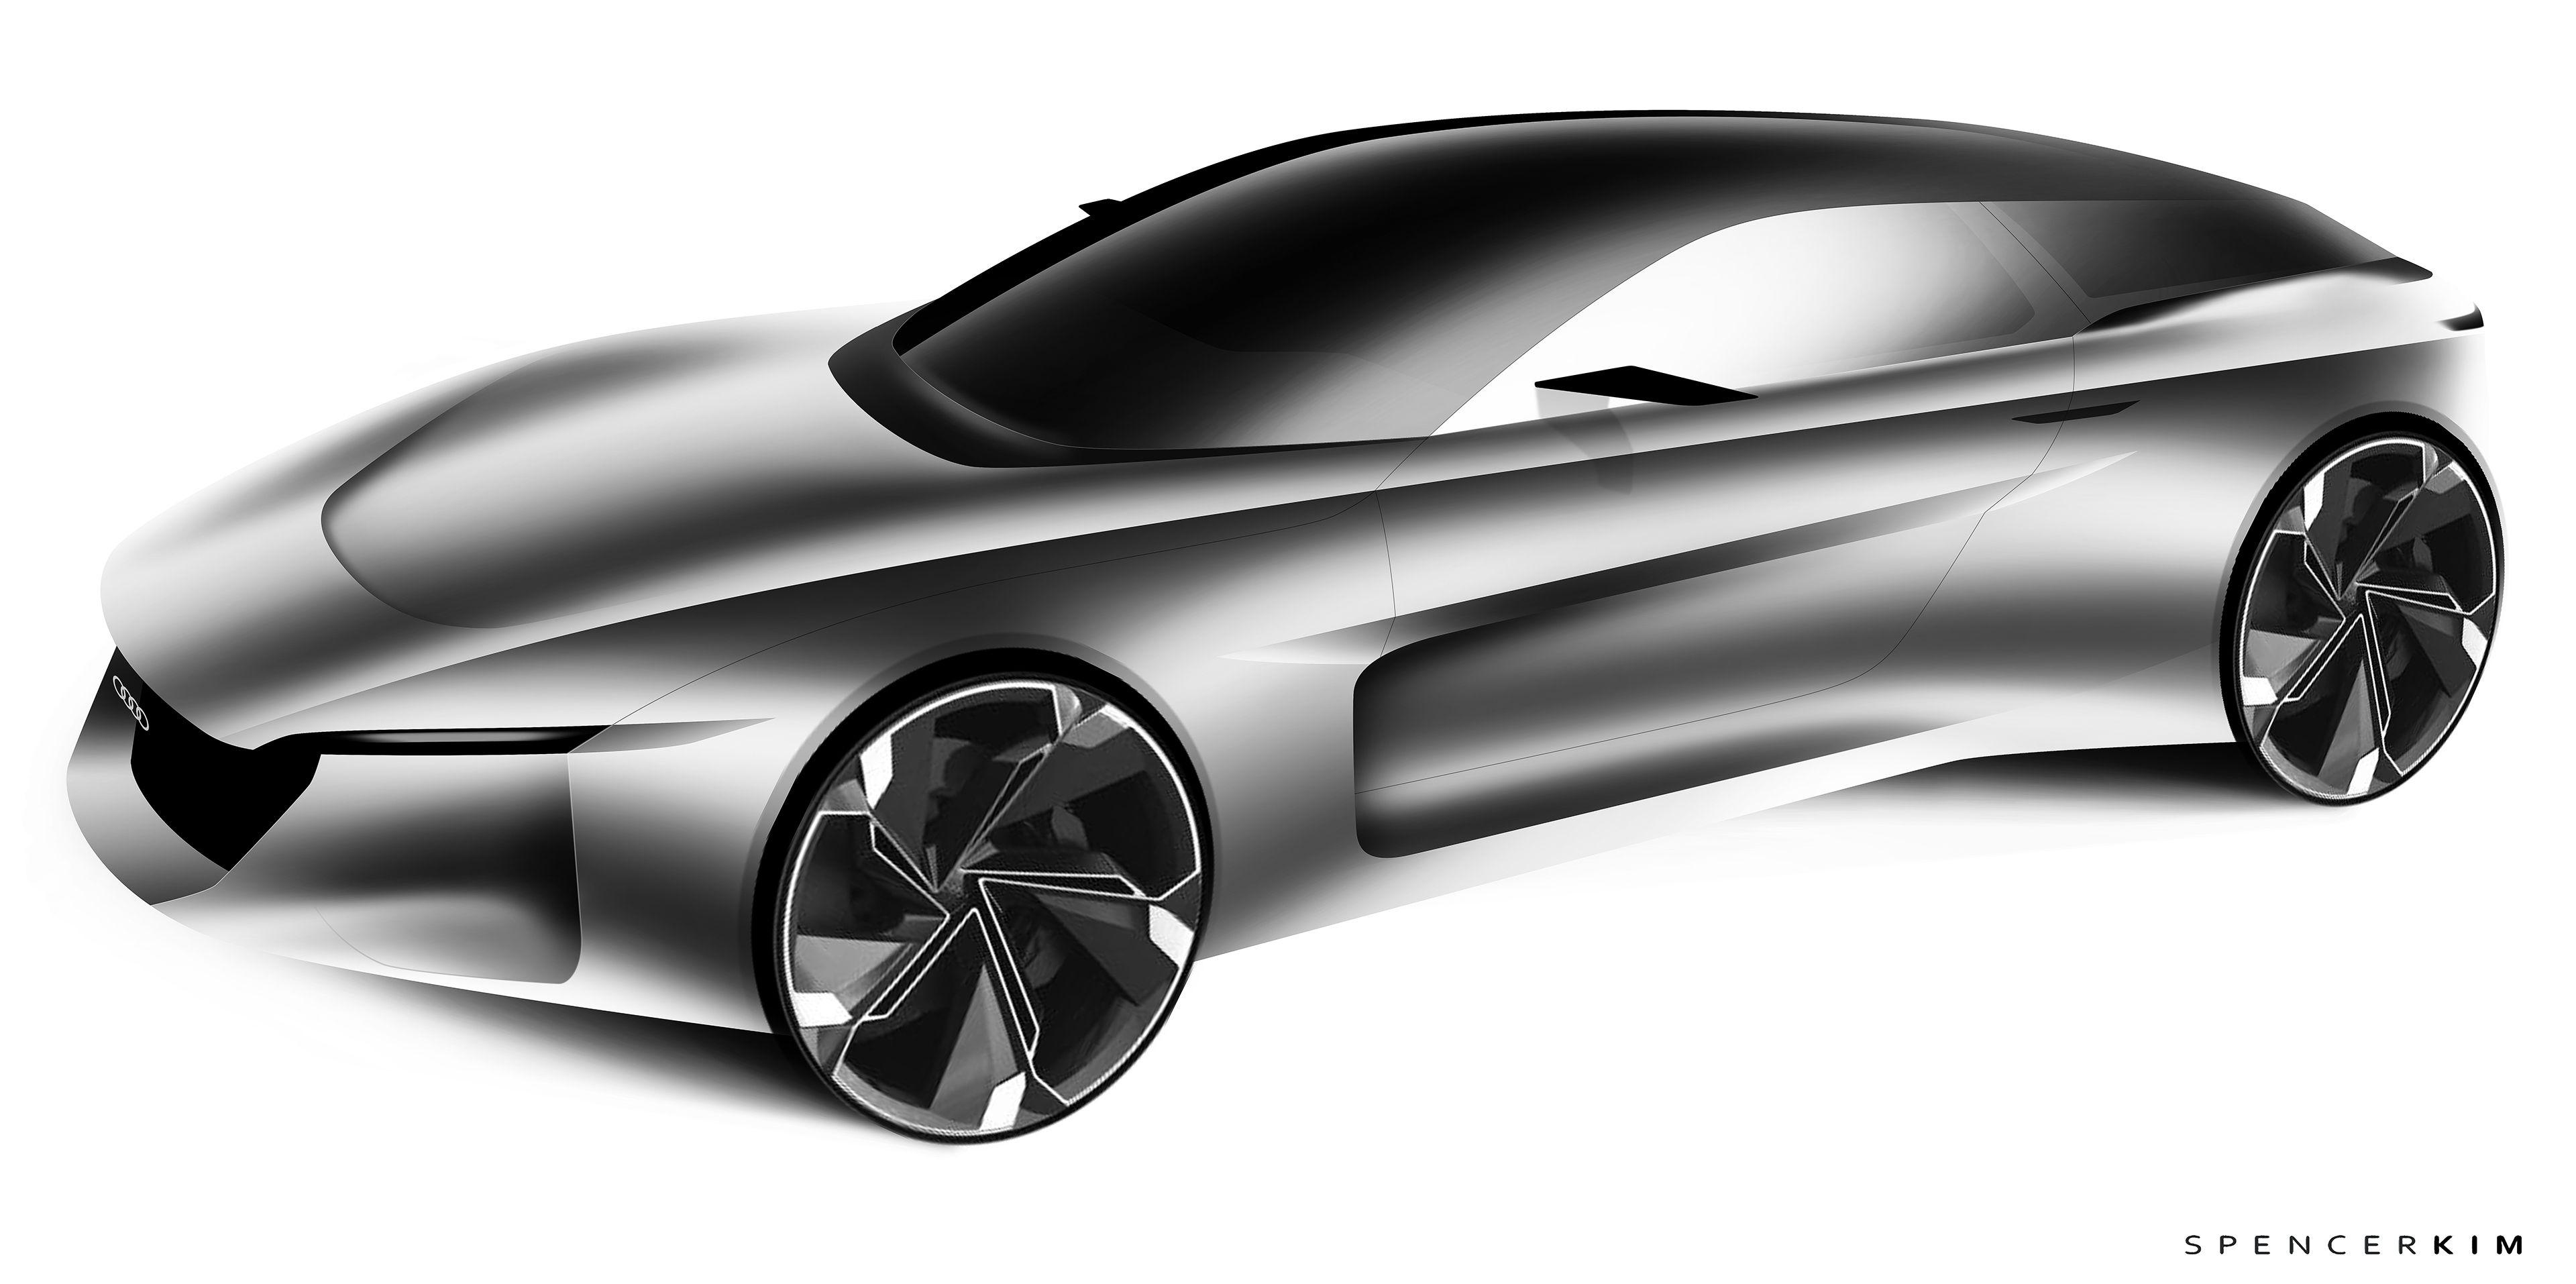 Frontlicht design daily routine  car design  pinterest  audi quattro audi and cars